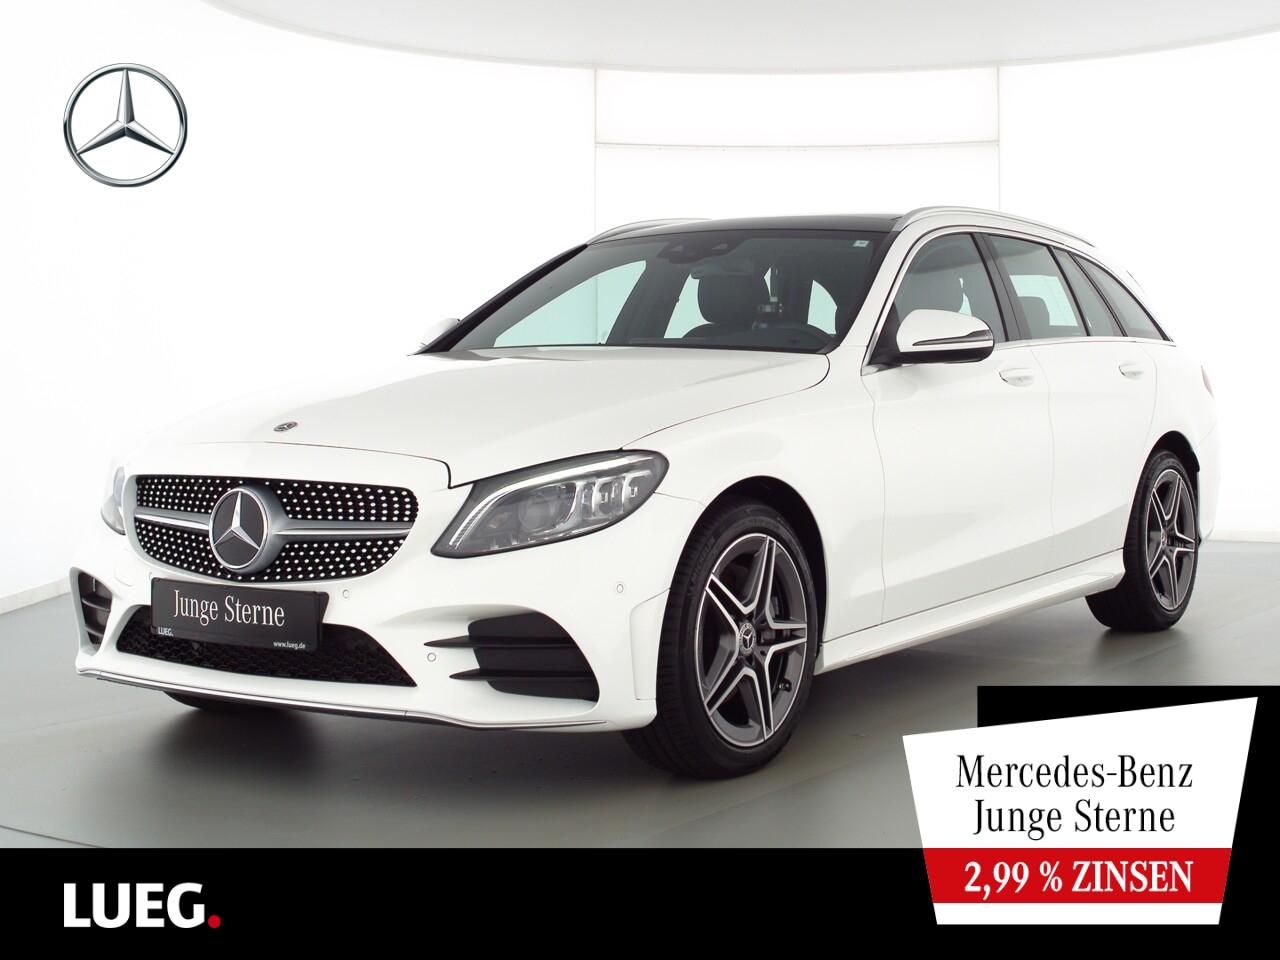 Mercedes-Benz C 220 d T 4M AMG+COM+Pano+Mbeam+AHK+SpurP+Kamera, Jahr 2020, Diesel